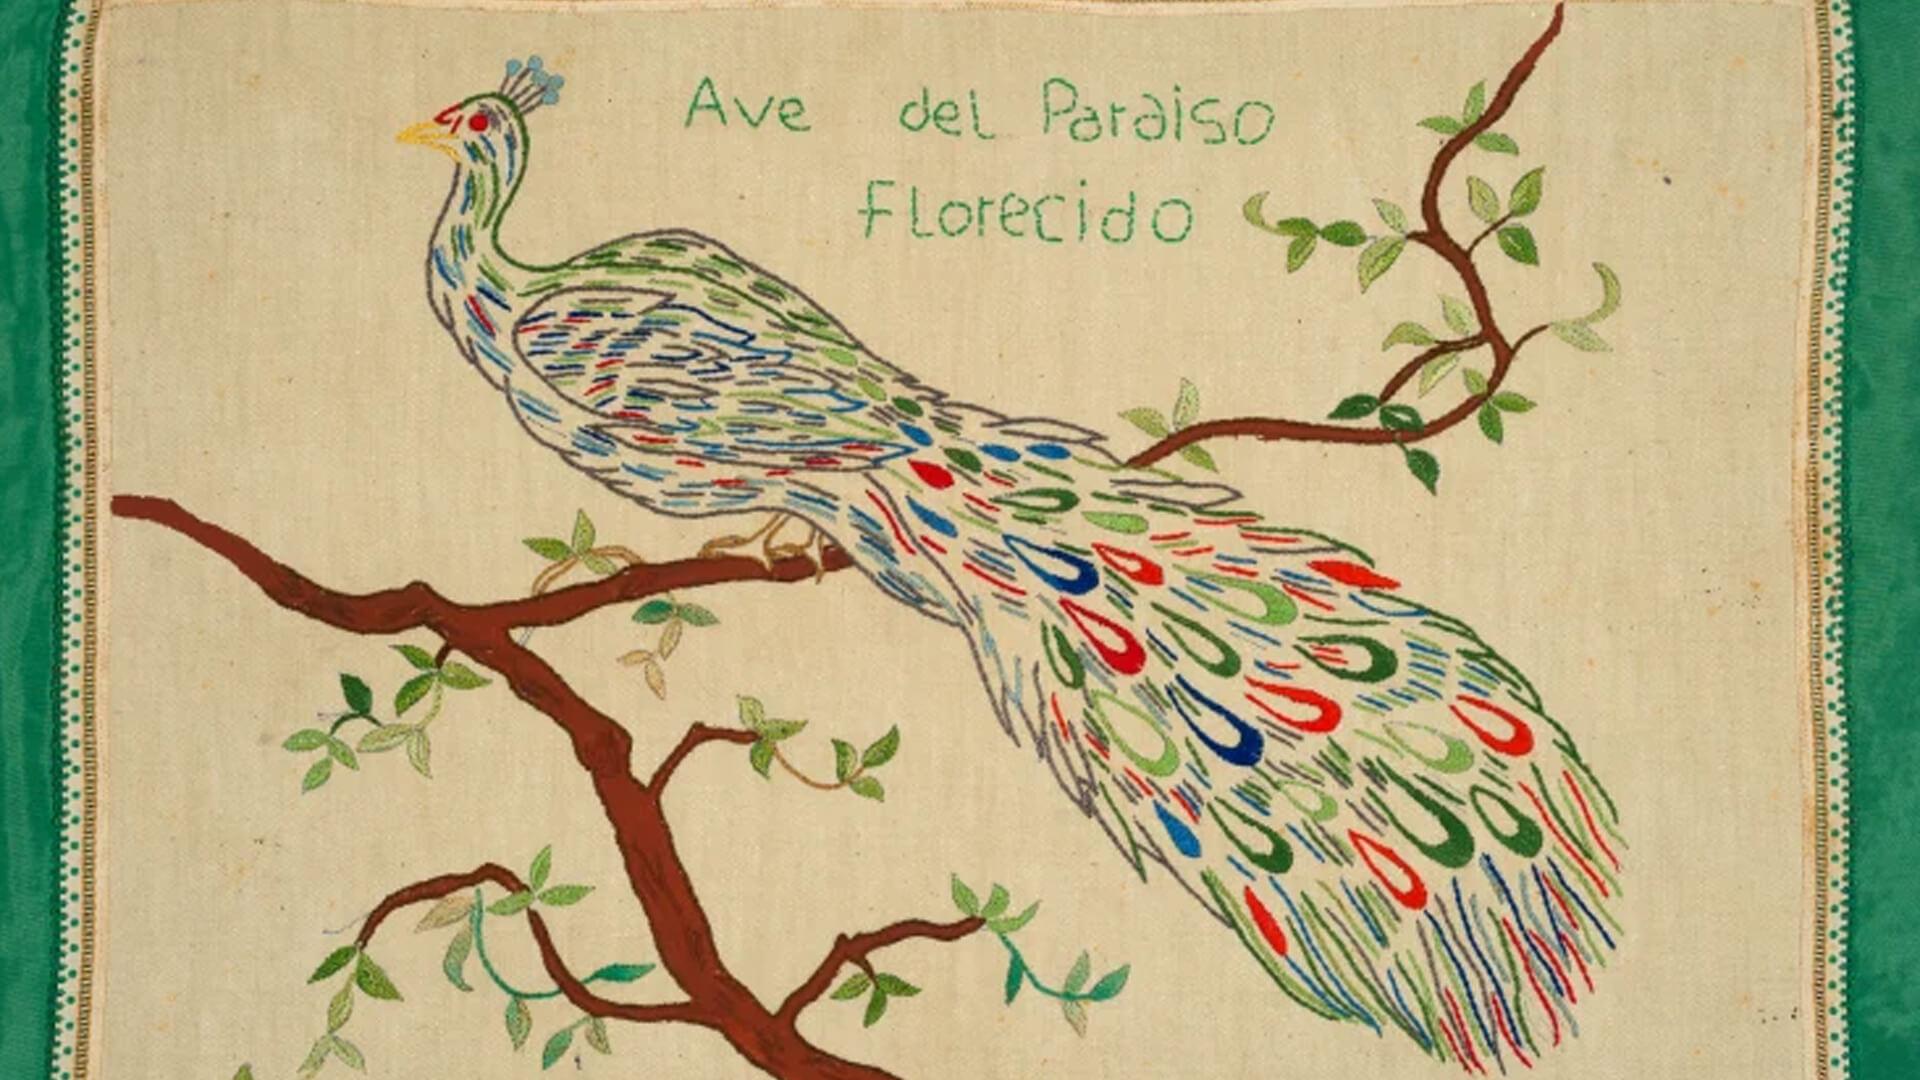 Ave del Paraiso Florecido, c. 1995